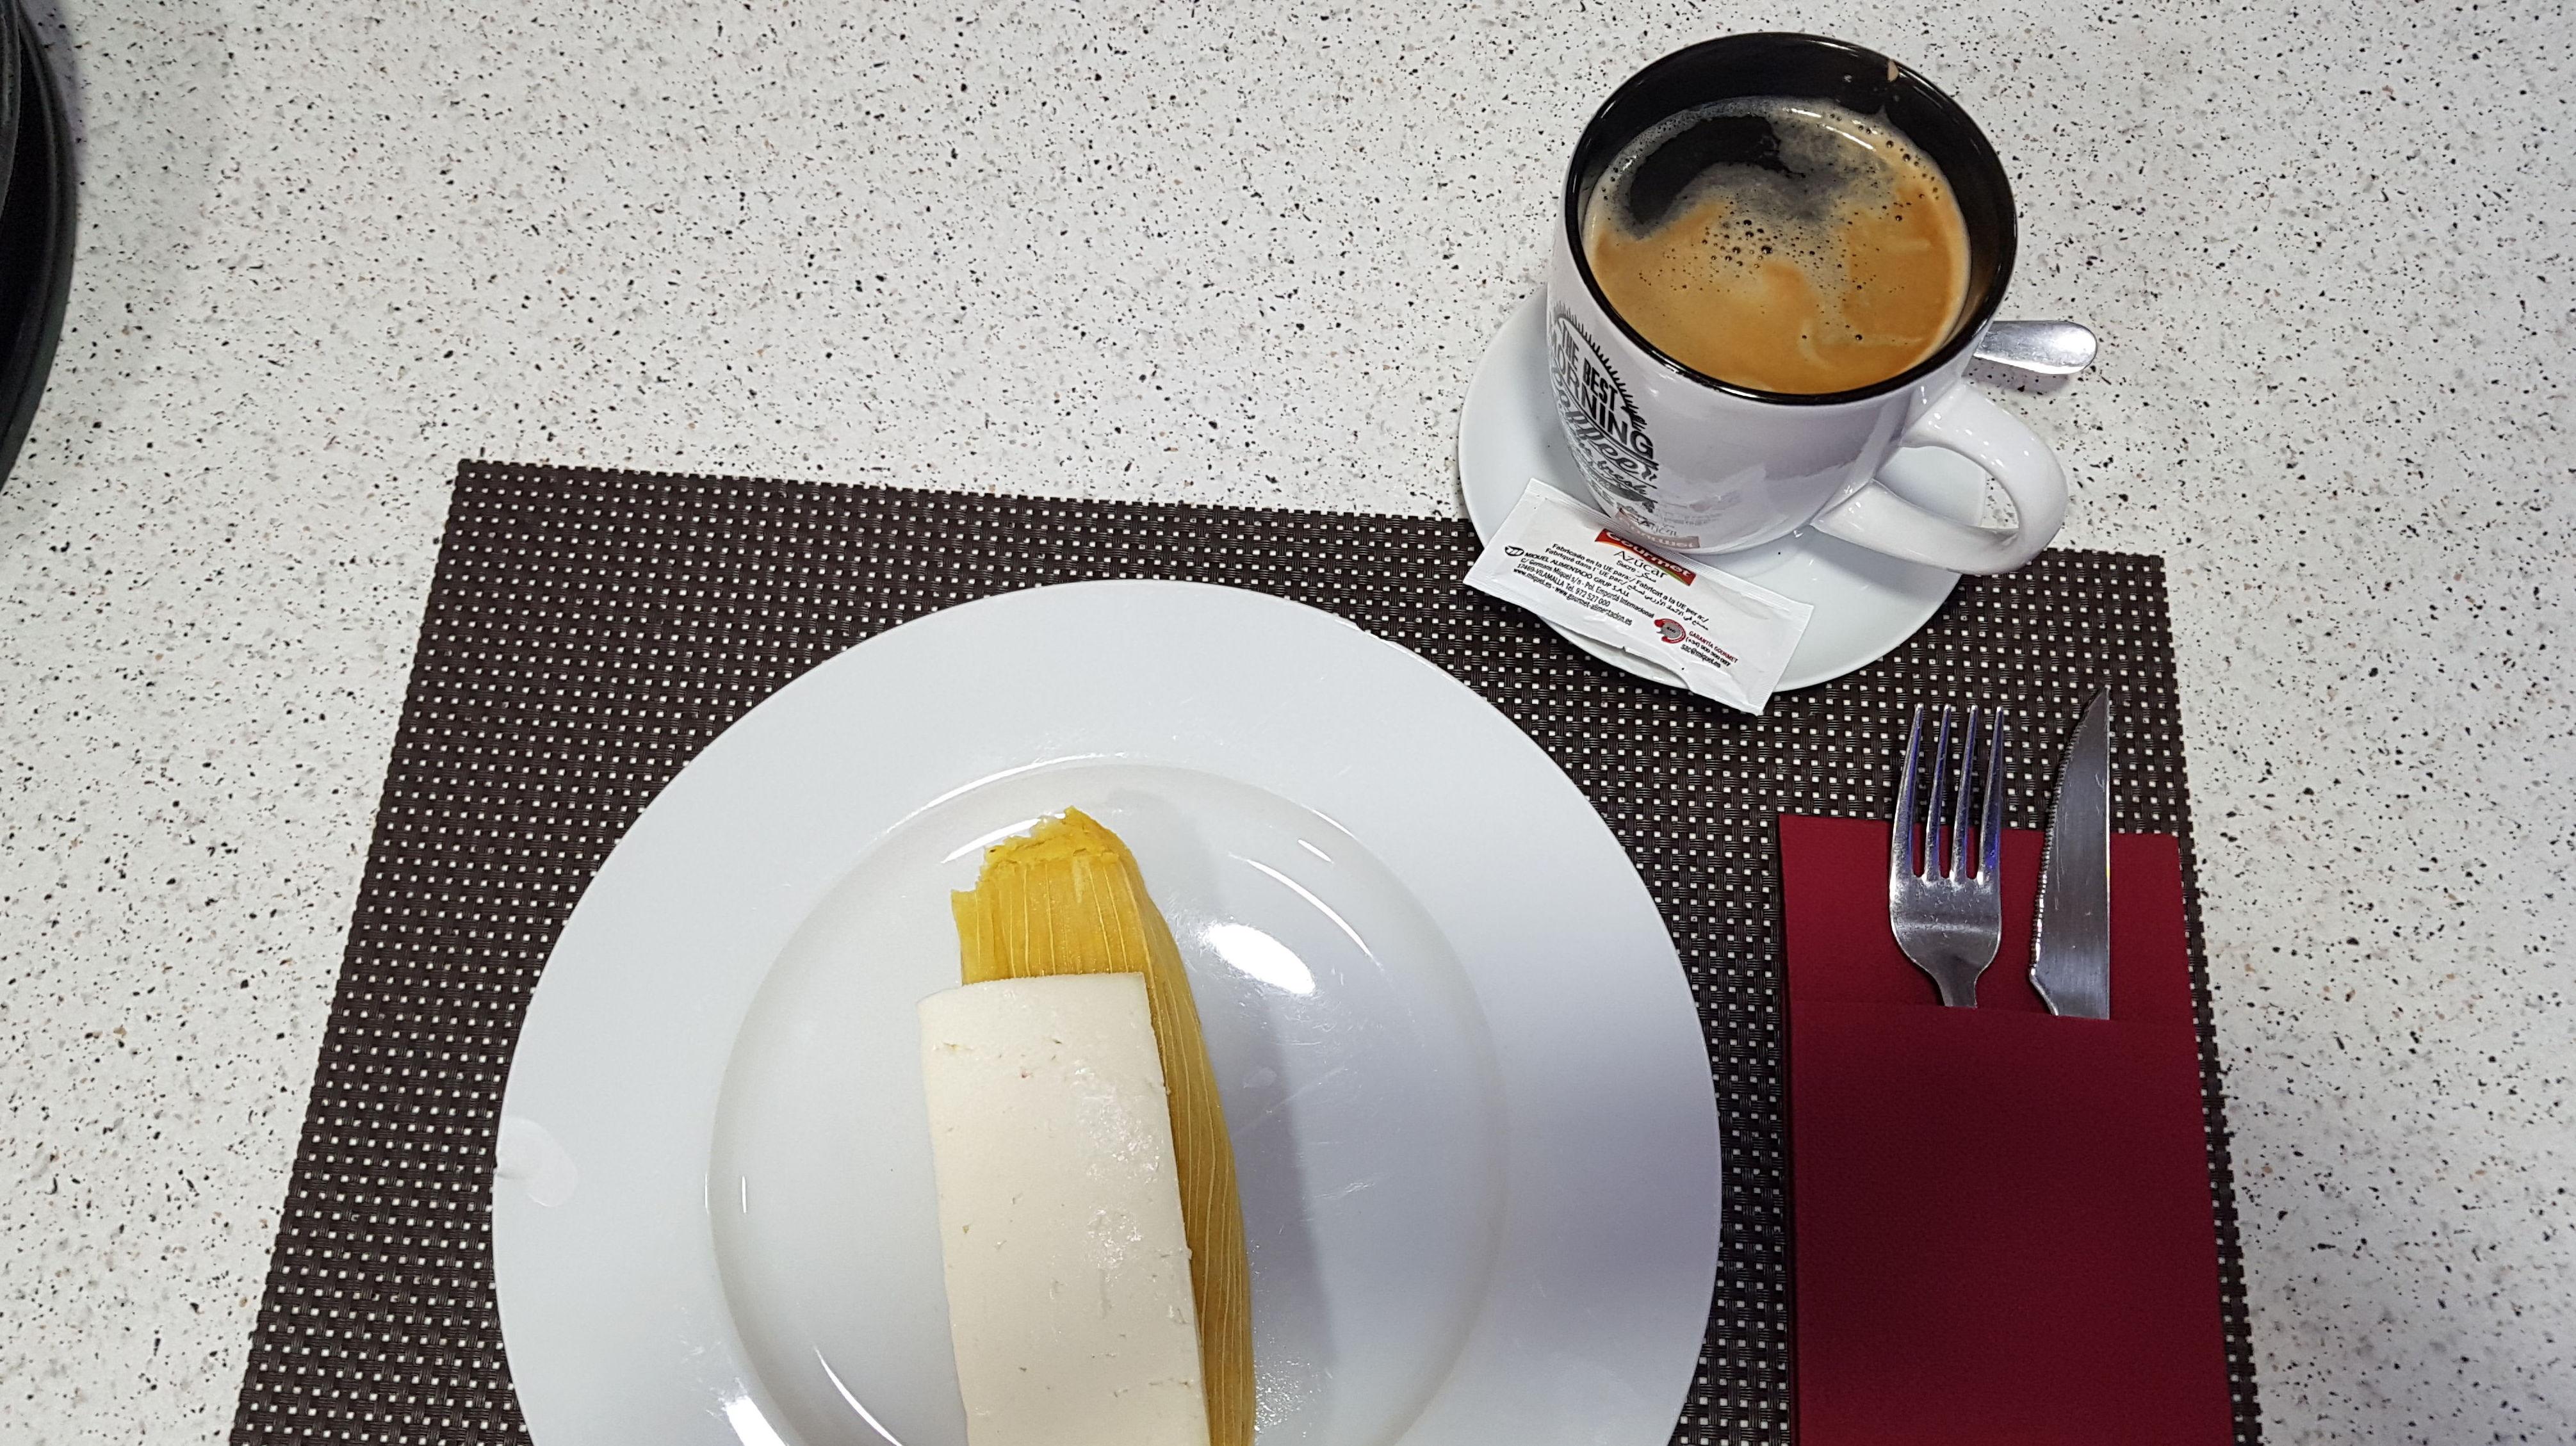 Desayuno de humita,embuelto,tamal  de maiz